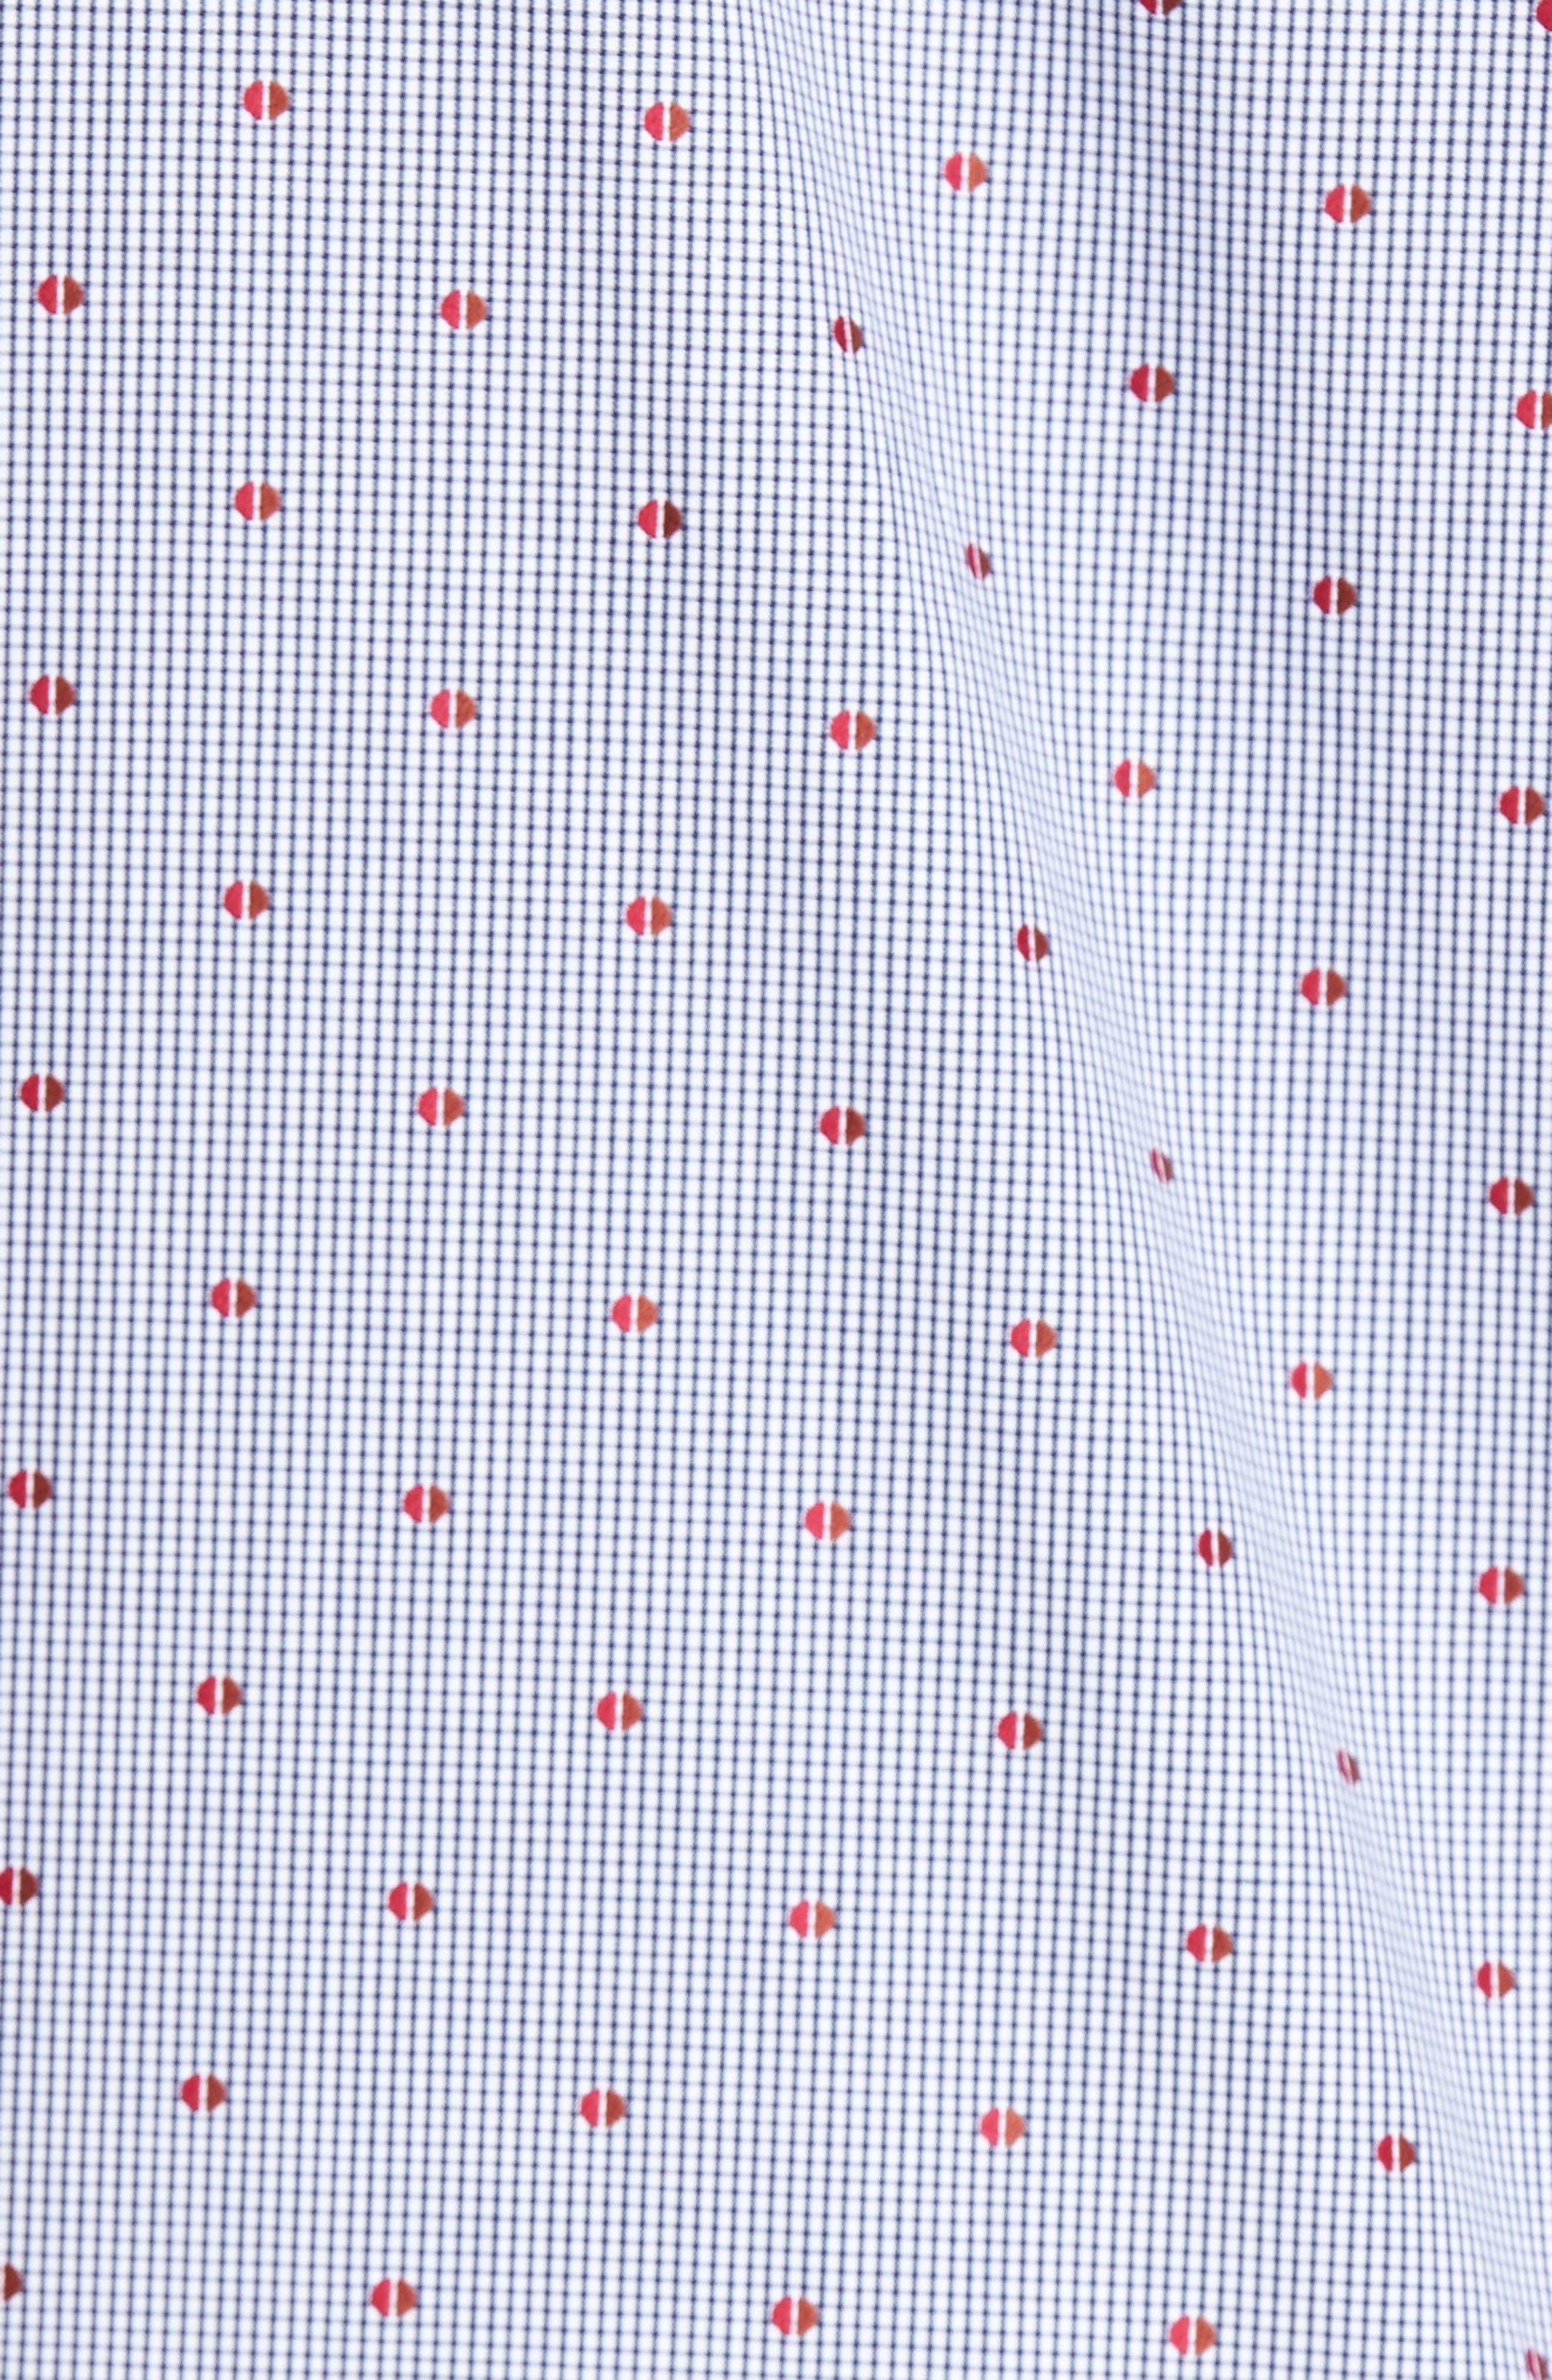 Short Sleeve Sport Shirt,                             Alternate thumbnail 5, color,                             Red/ Brown Check Red Dot Dobby